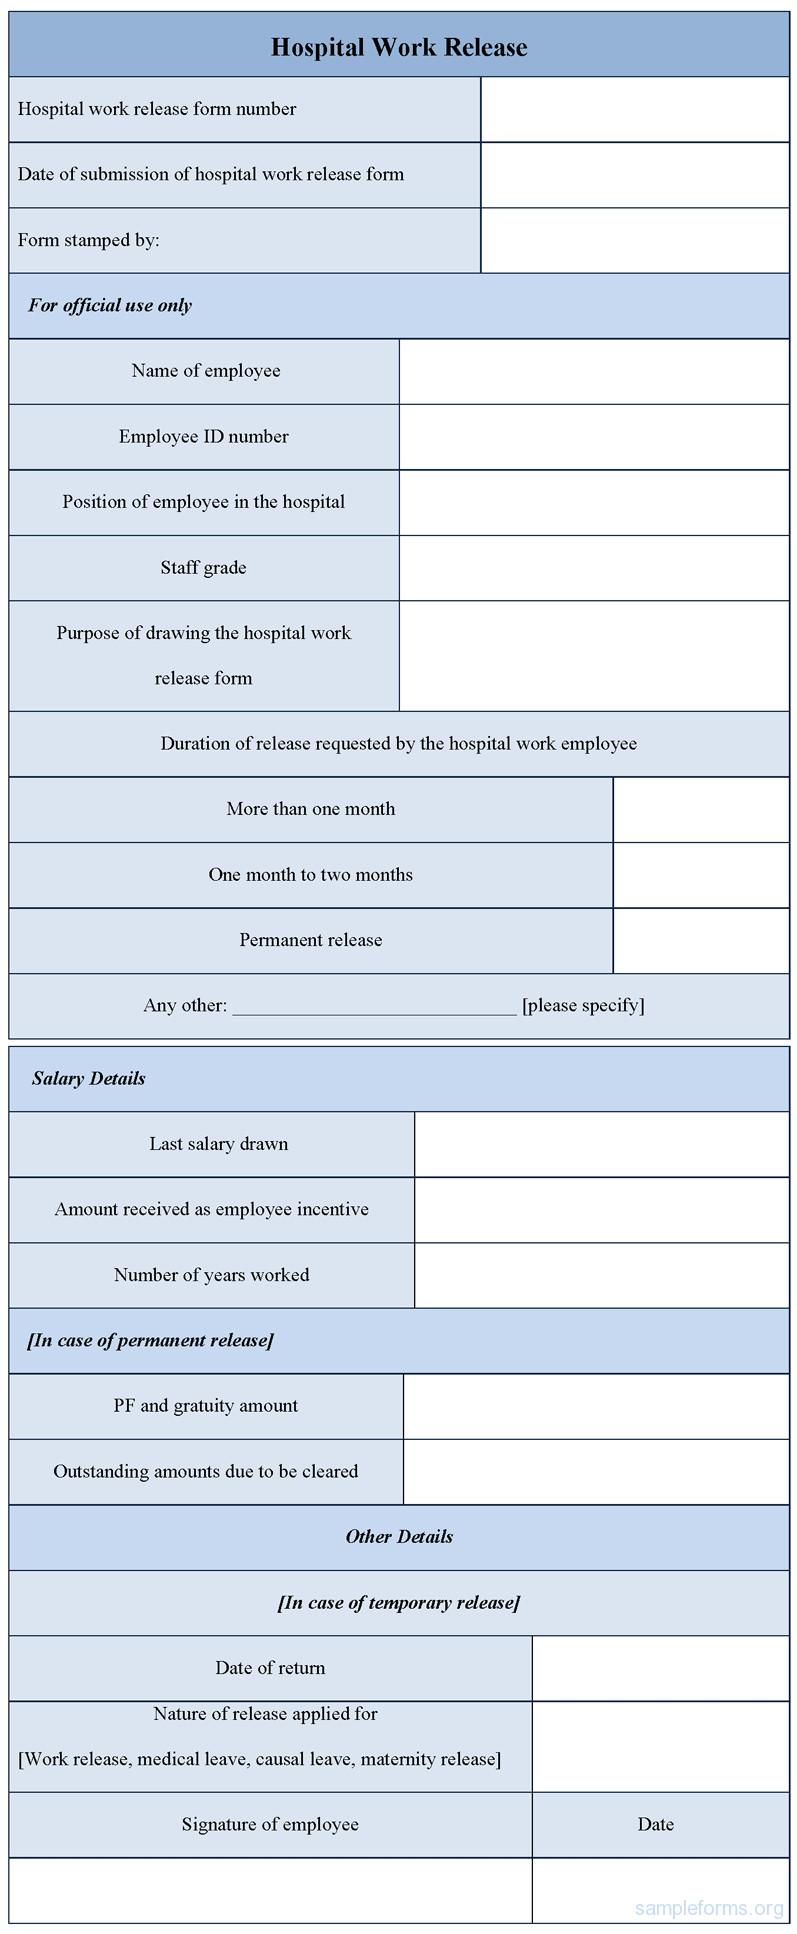 Hospital Release form Template Hospital Work Release form Sample forms